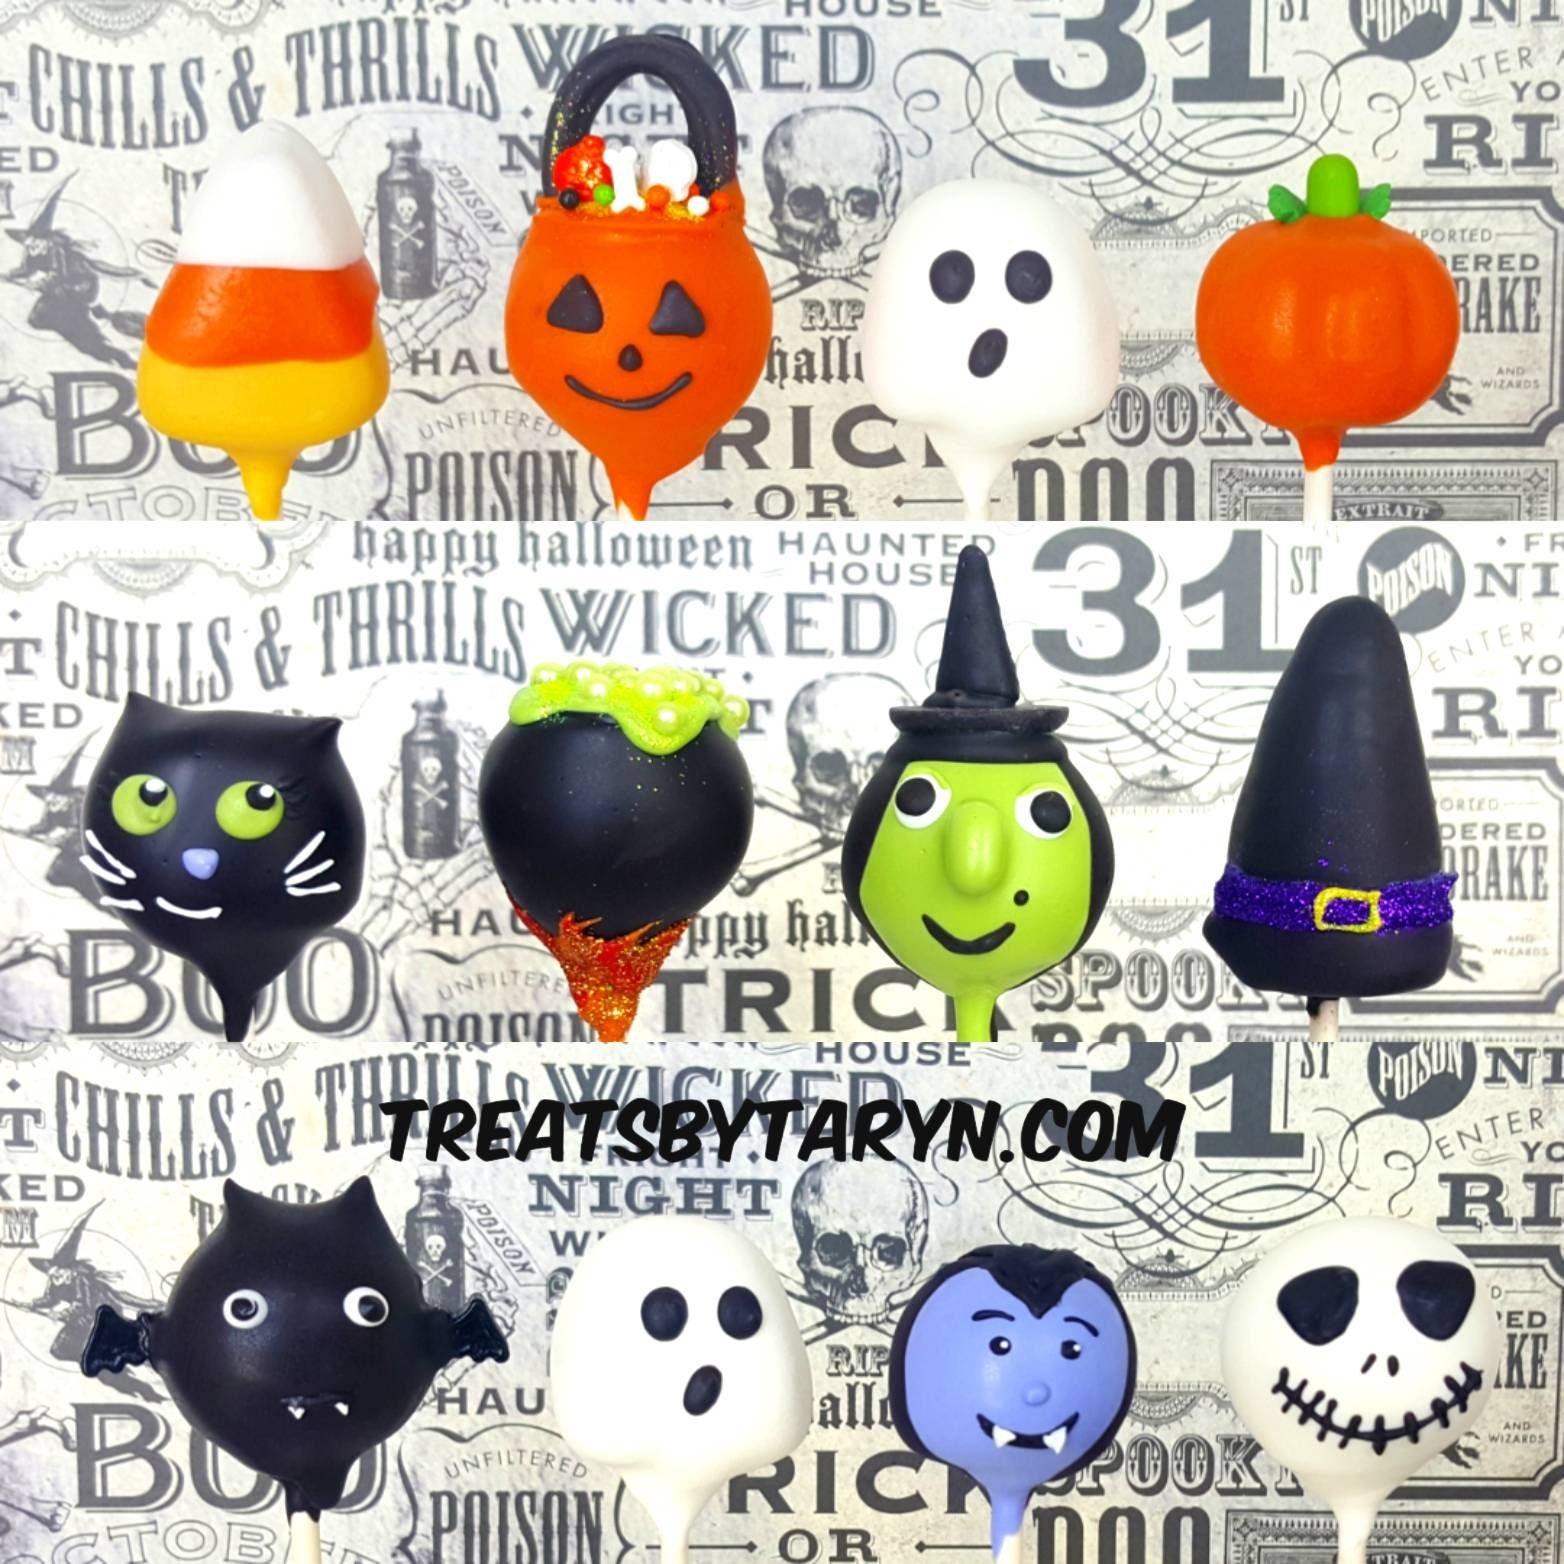 halloween variety cake pops. halloween cat cake pop. halloween